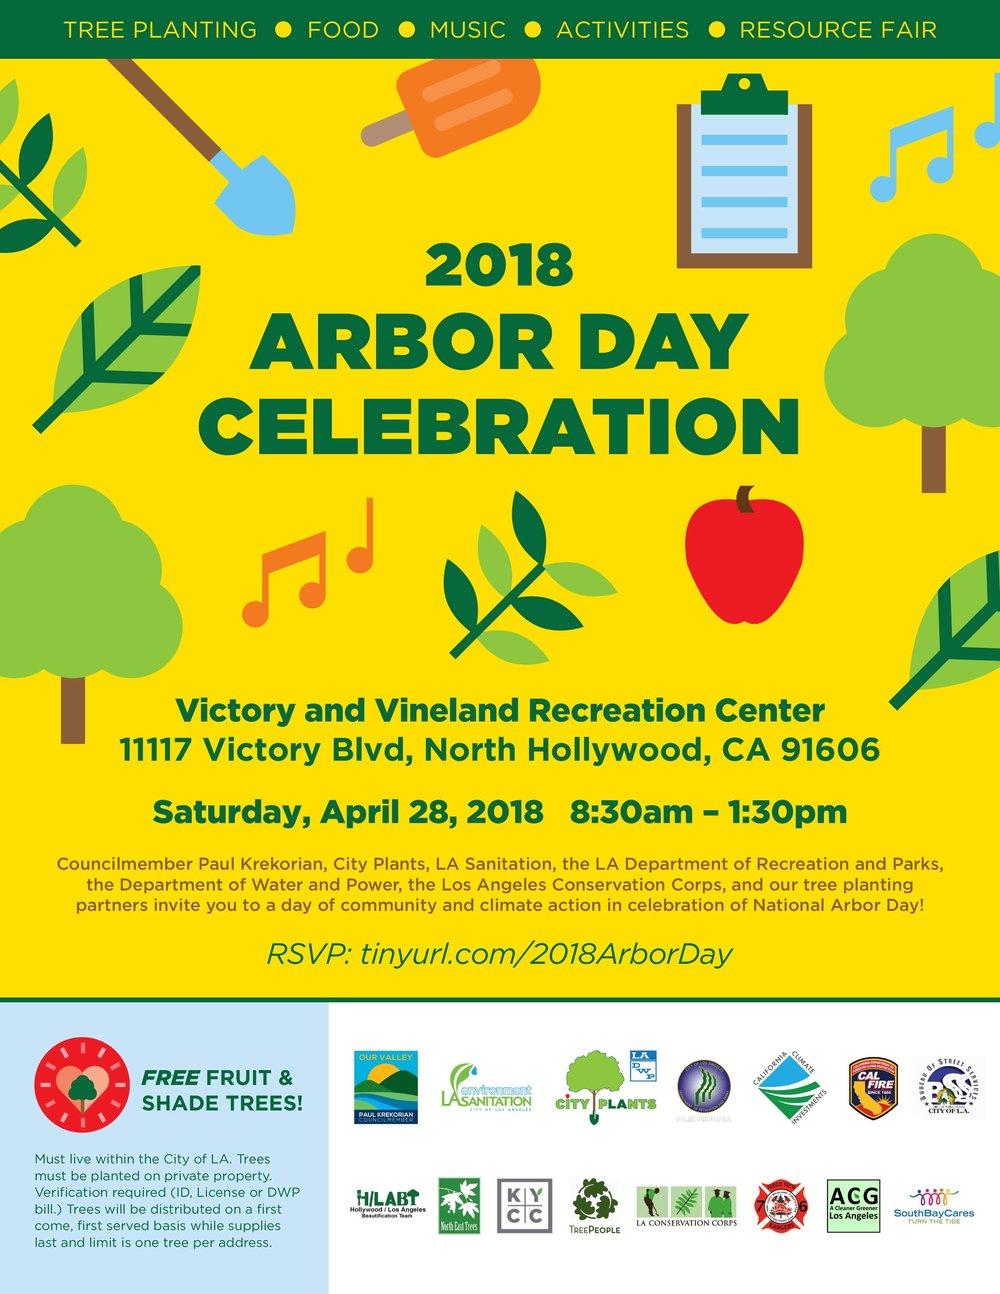 2018 Arbor Day Celebration Flyer - English.jpg